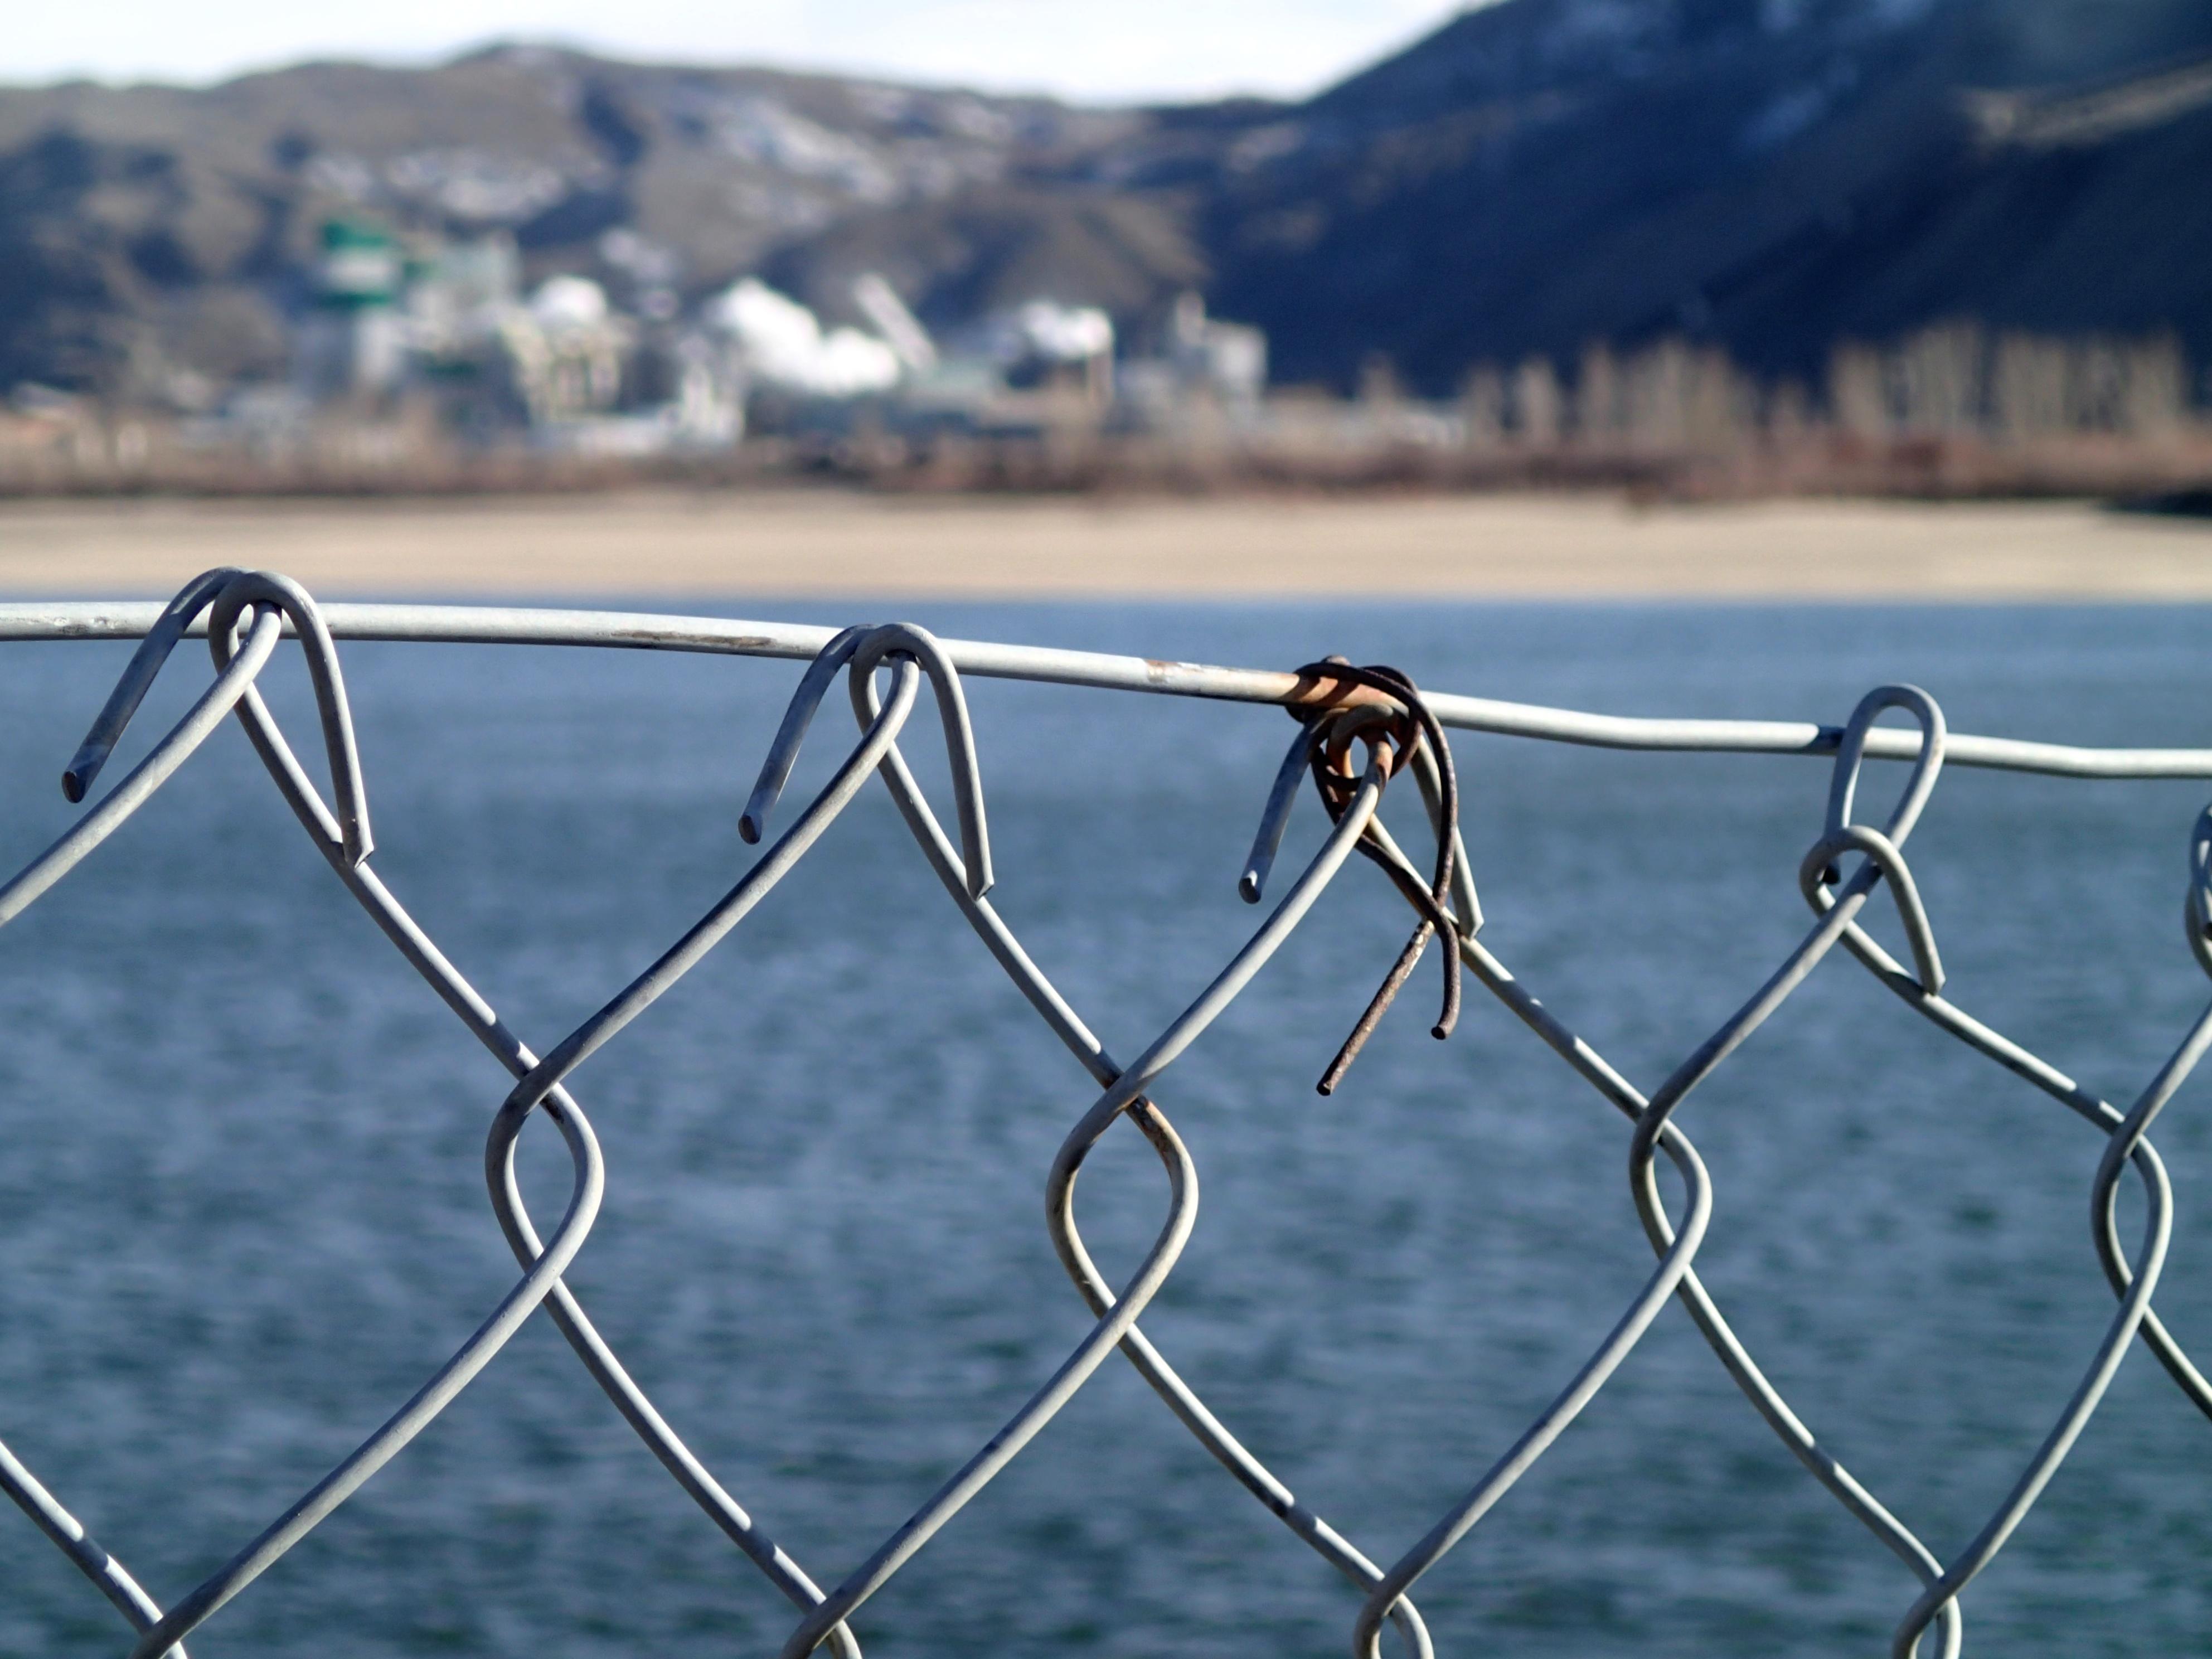 Kostenlose foto : Zaun, Wind, Linie, Mast, blau, Elektrizität ...